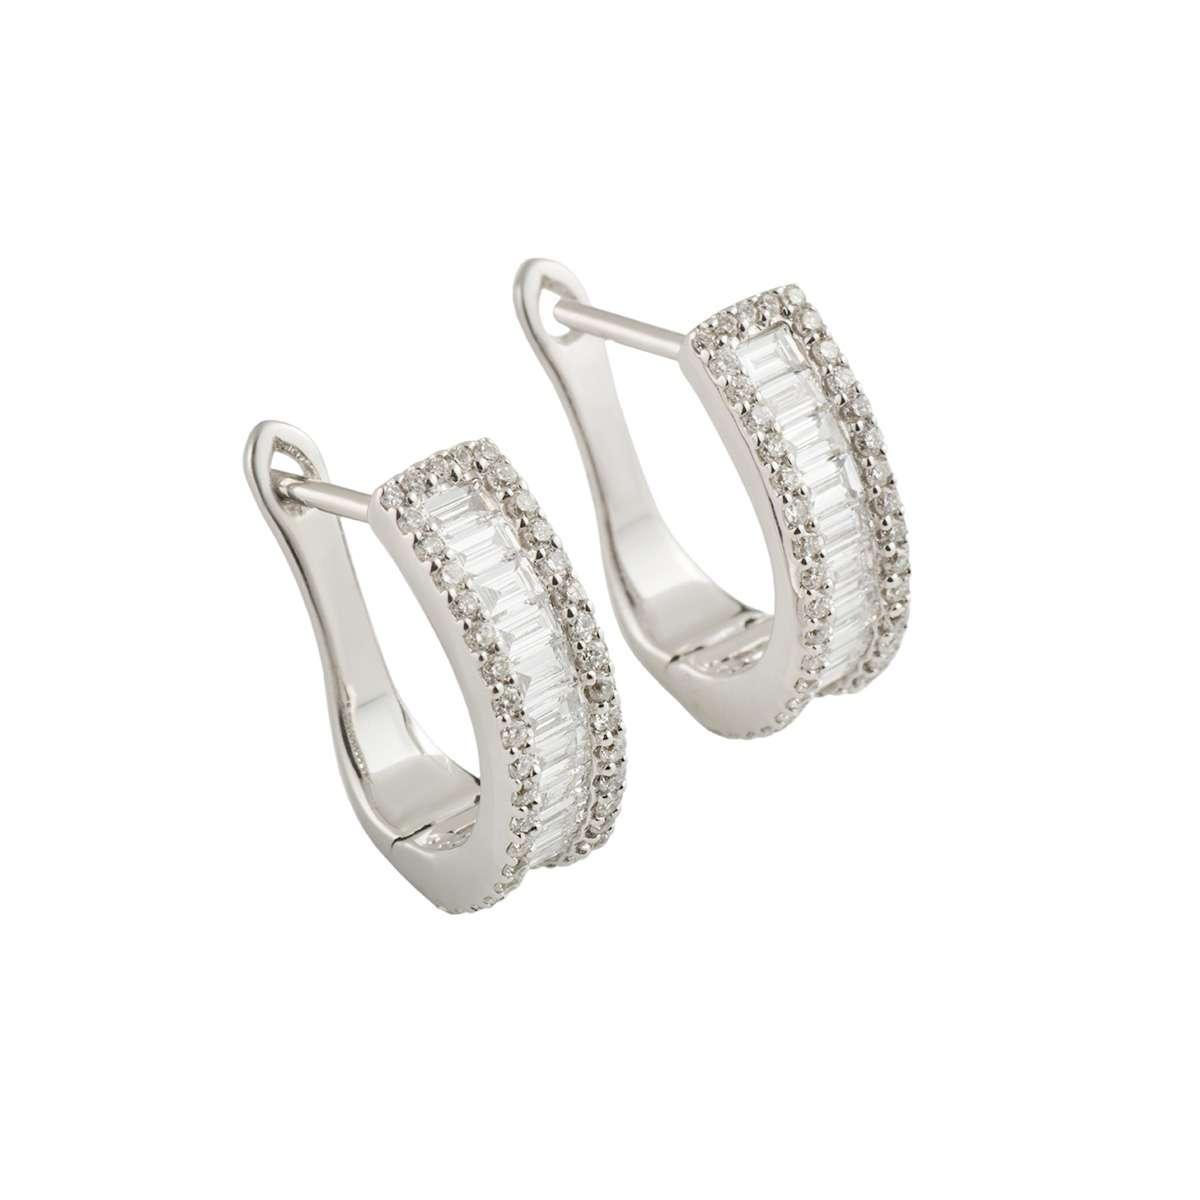 White Gold Diamond Hoop Earrings 1.35ct